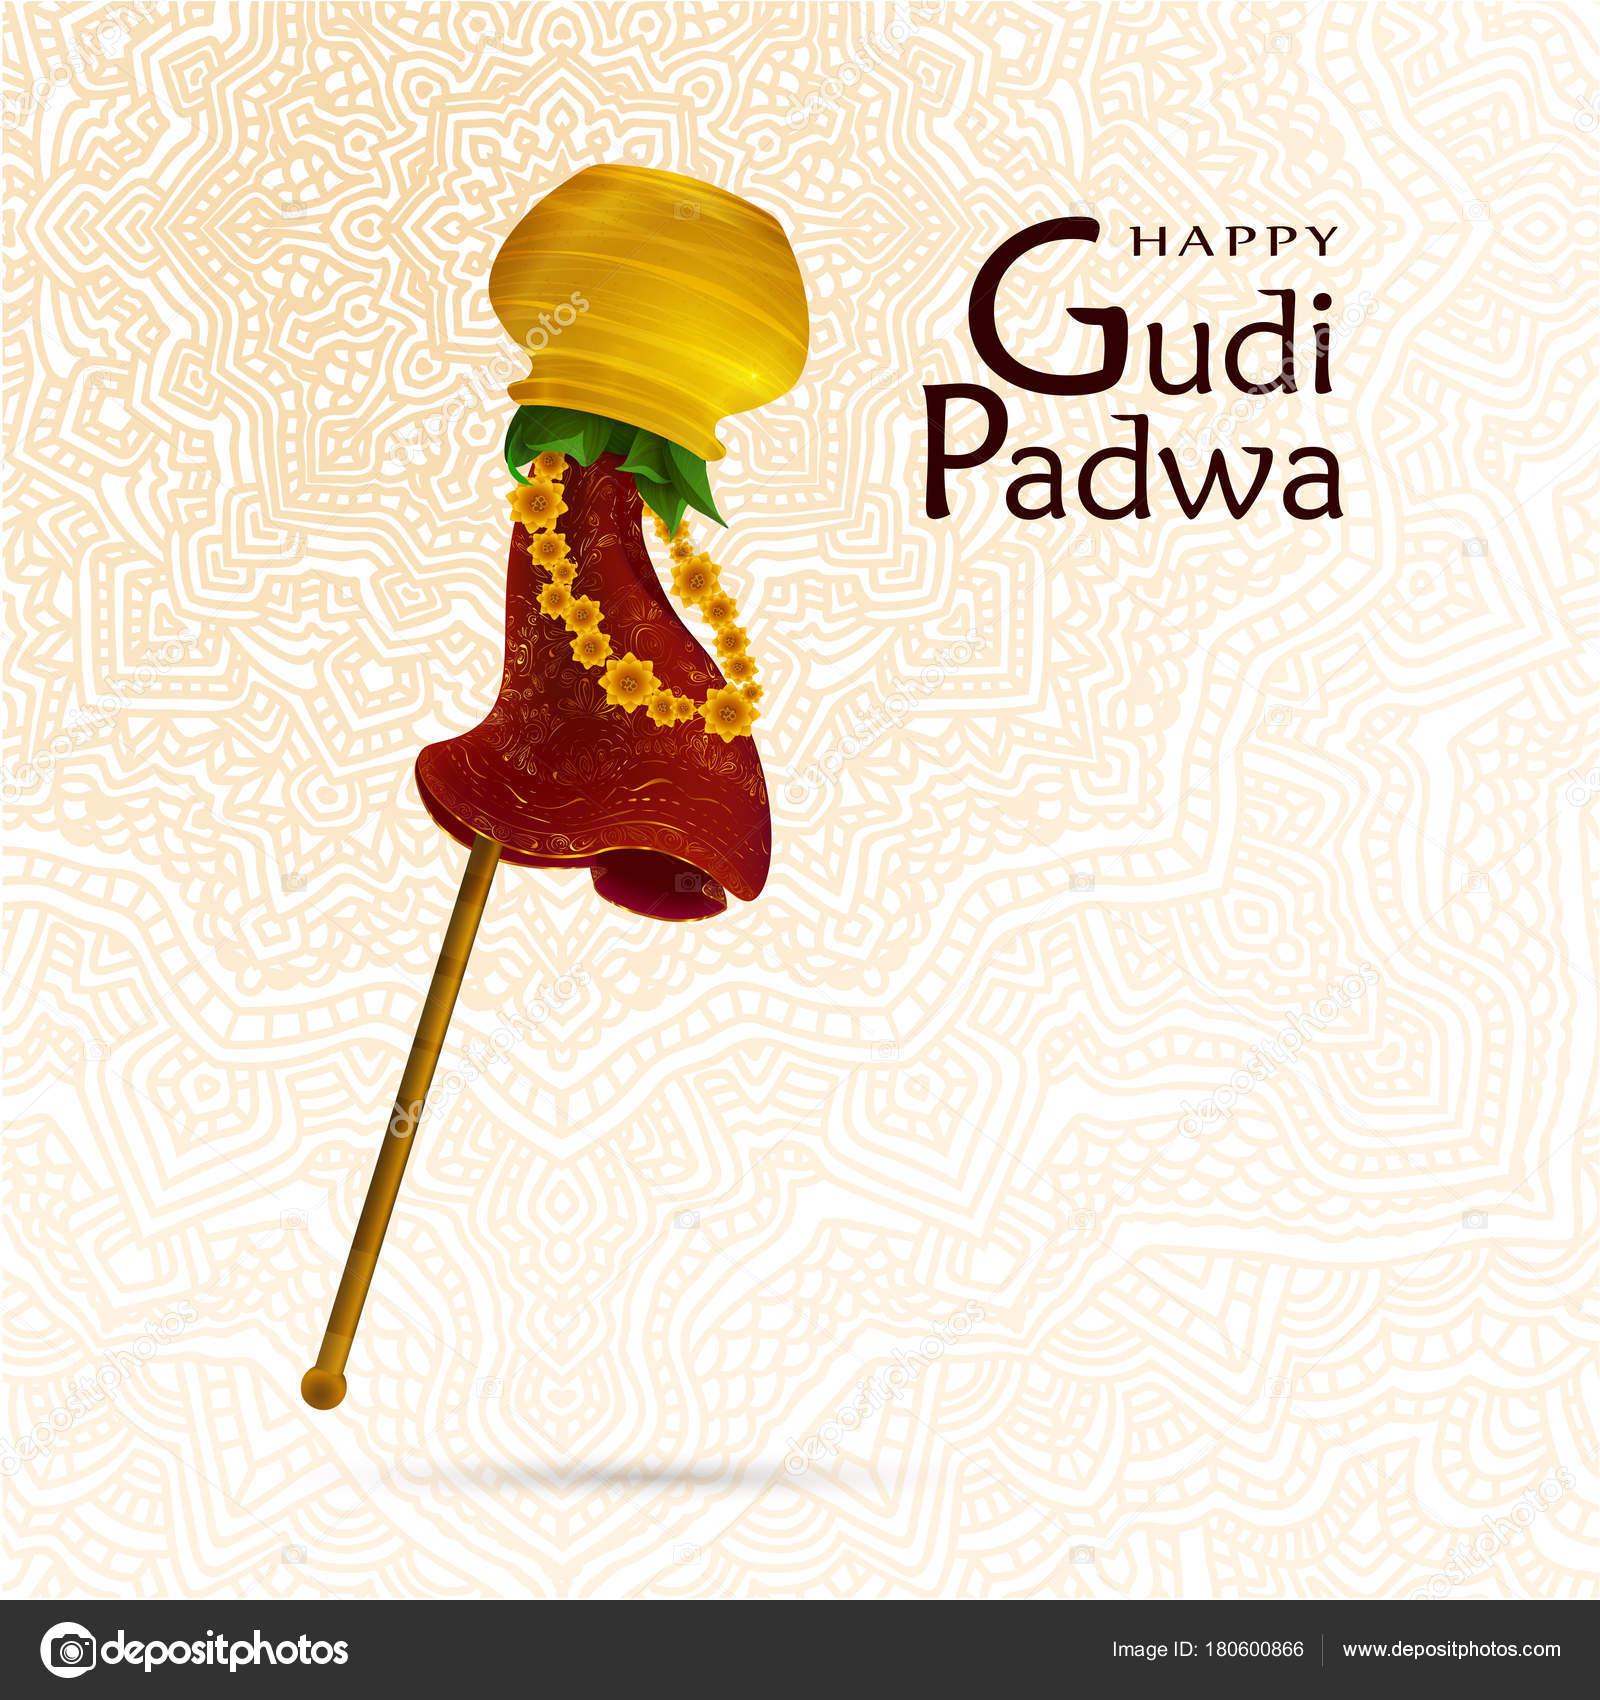 Happy Gudi Padwa Celebration India Template Greeting Card Hand Drawn